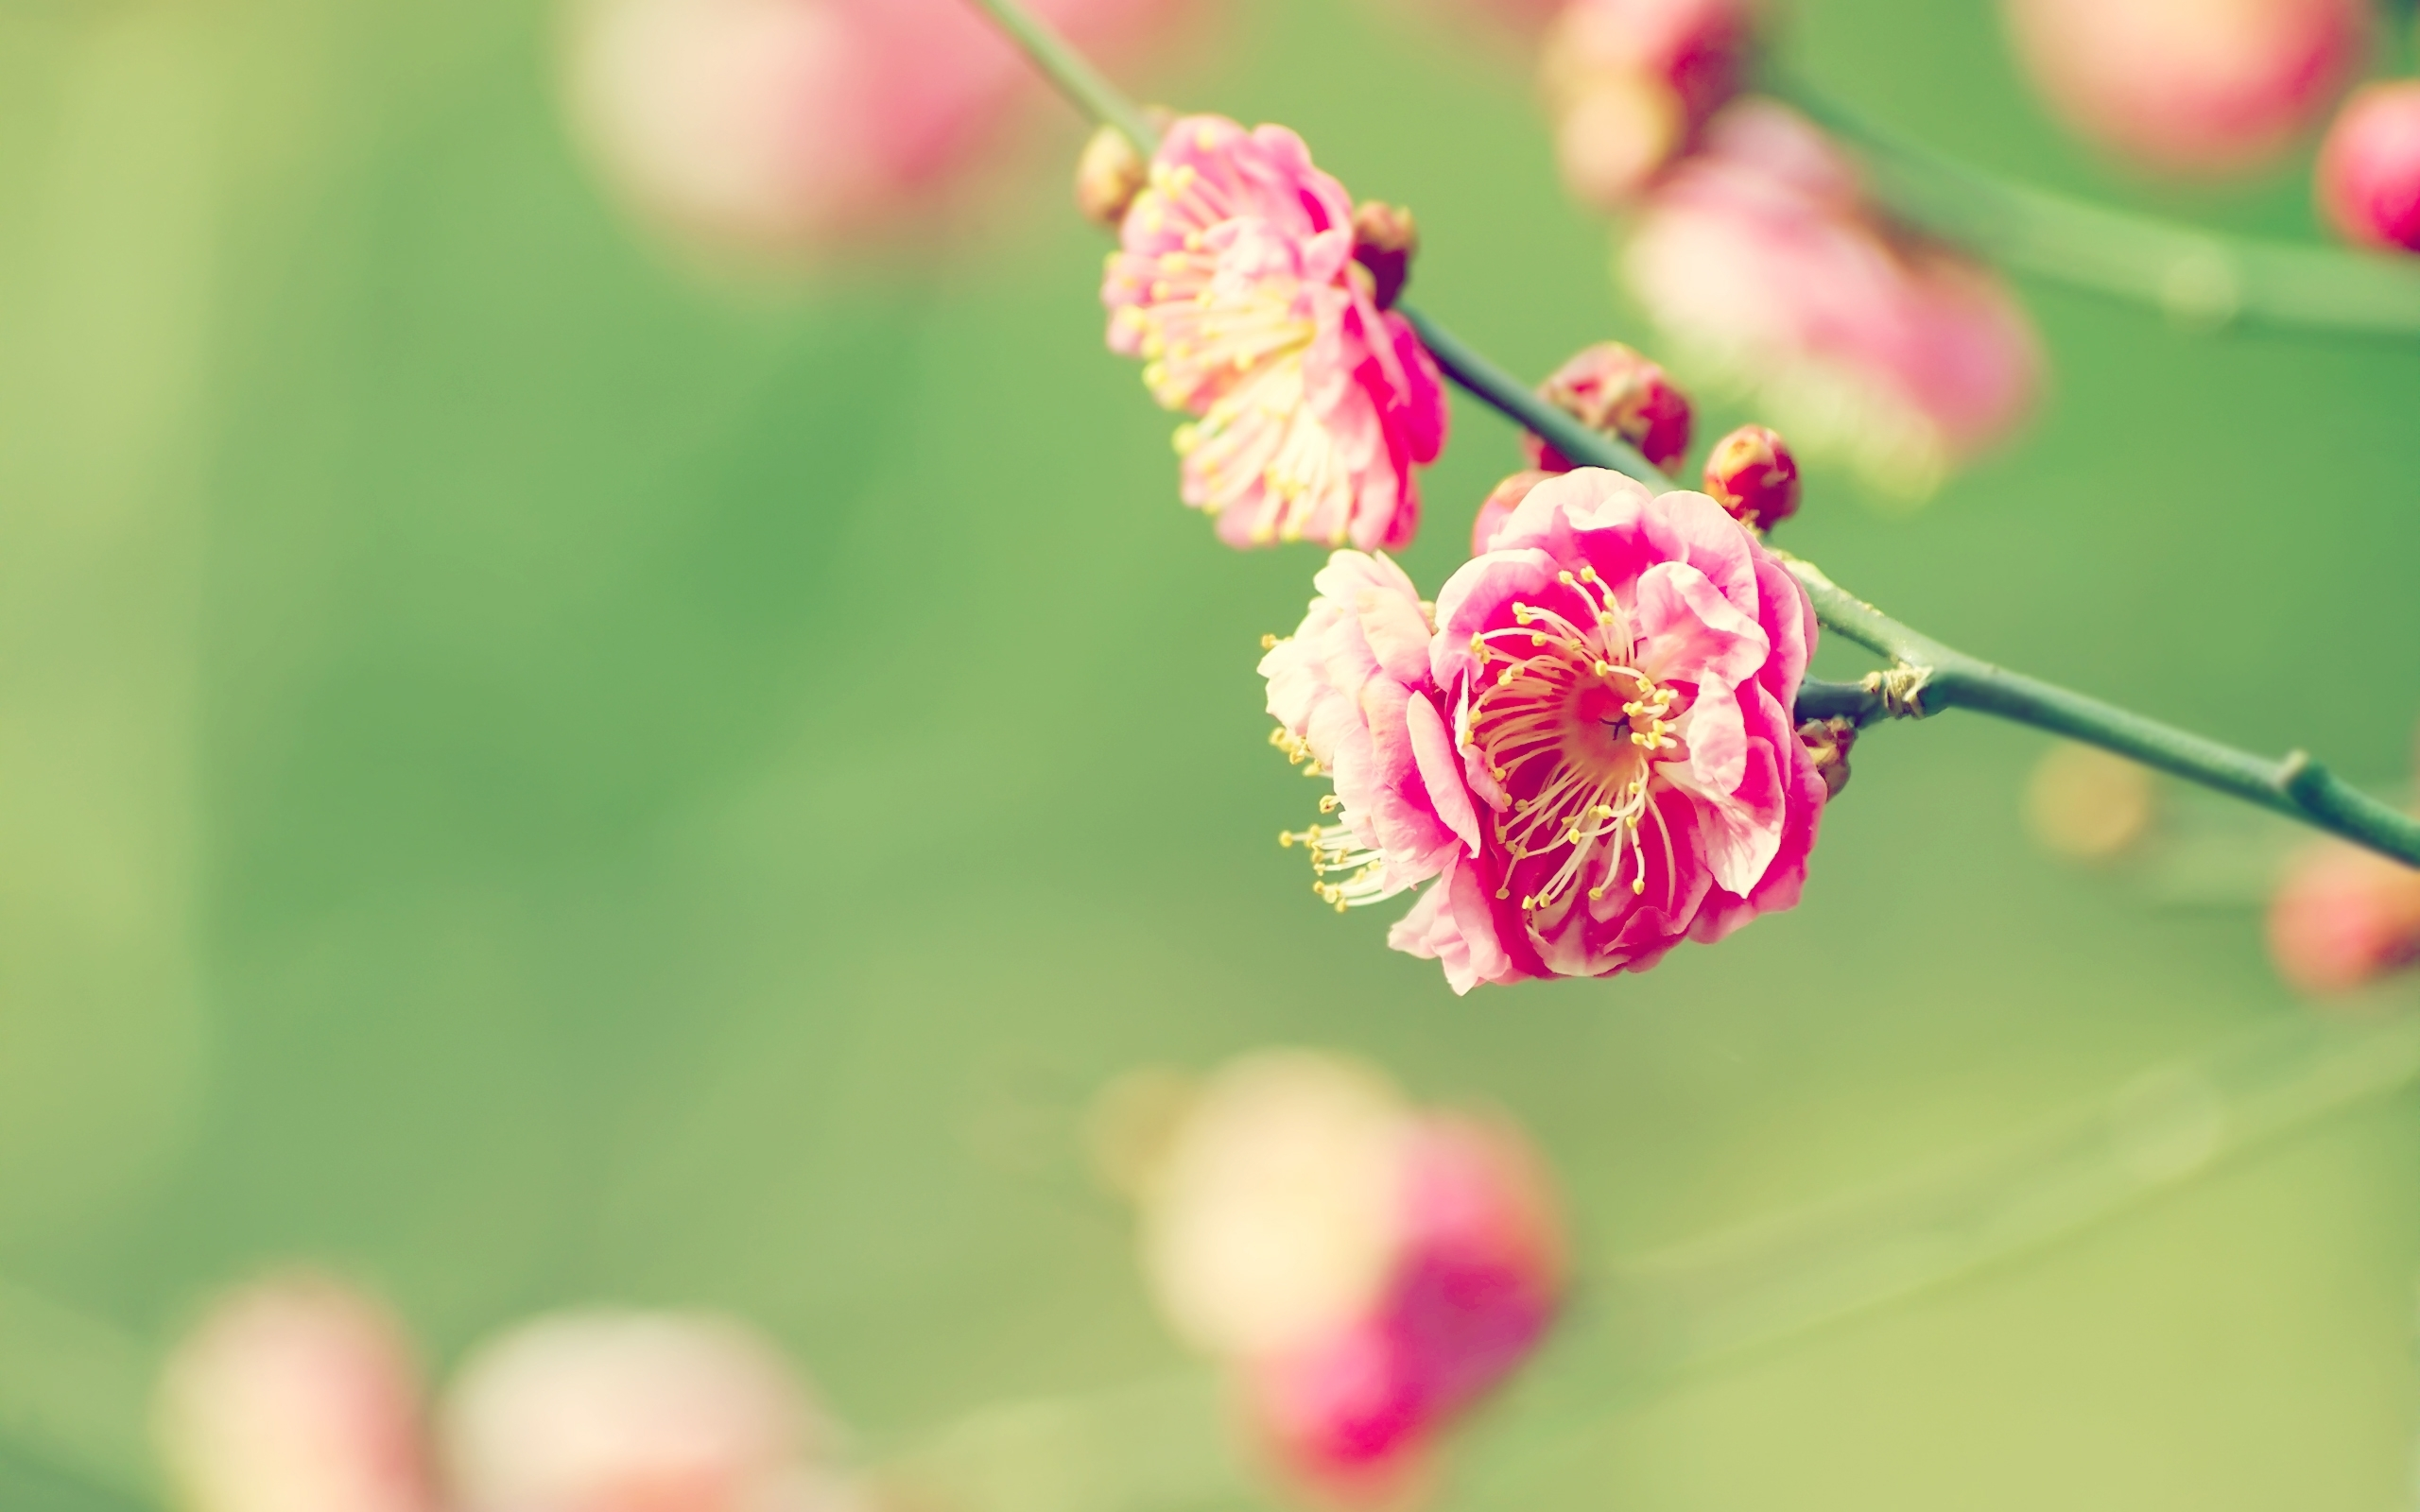 preview spring flowers wallpaper | feelgrafix | pinterest